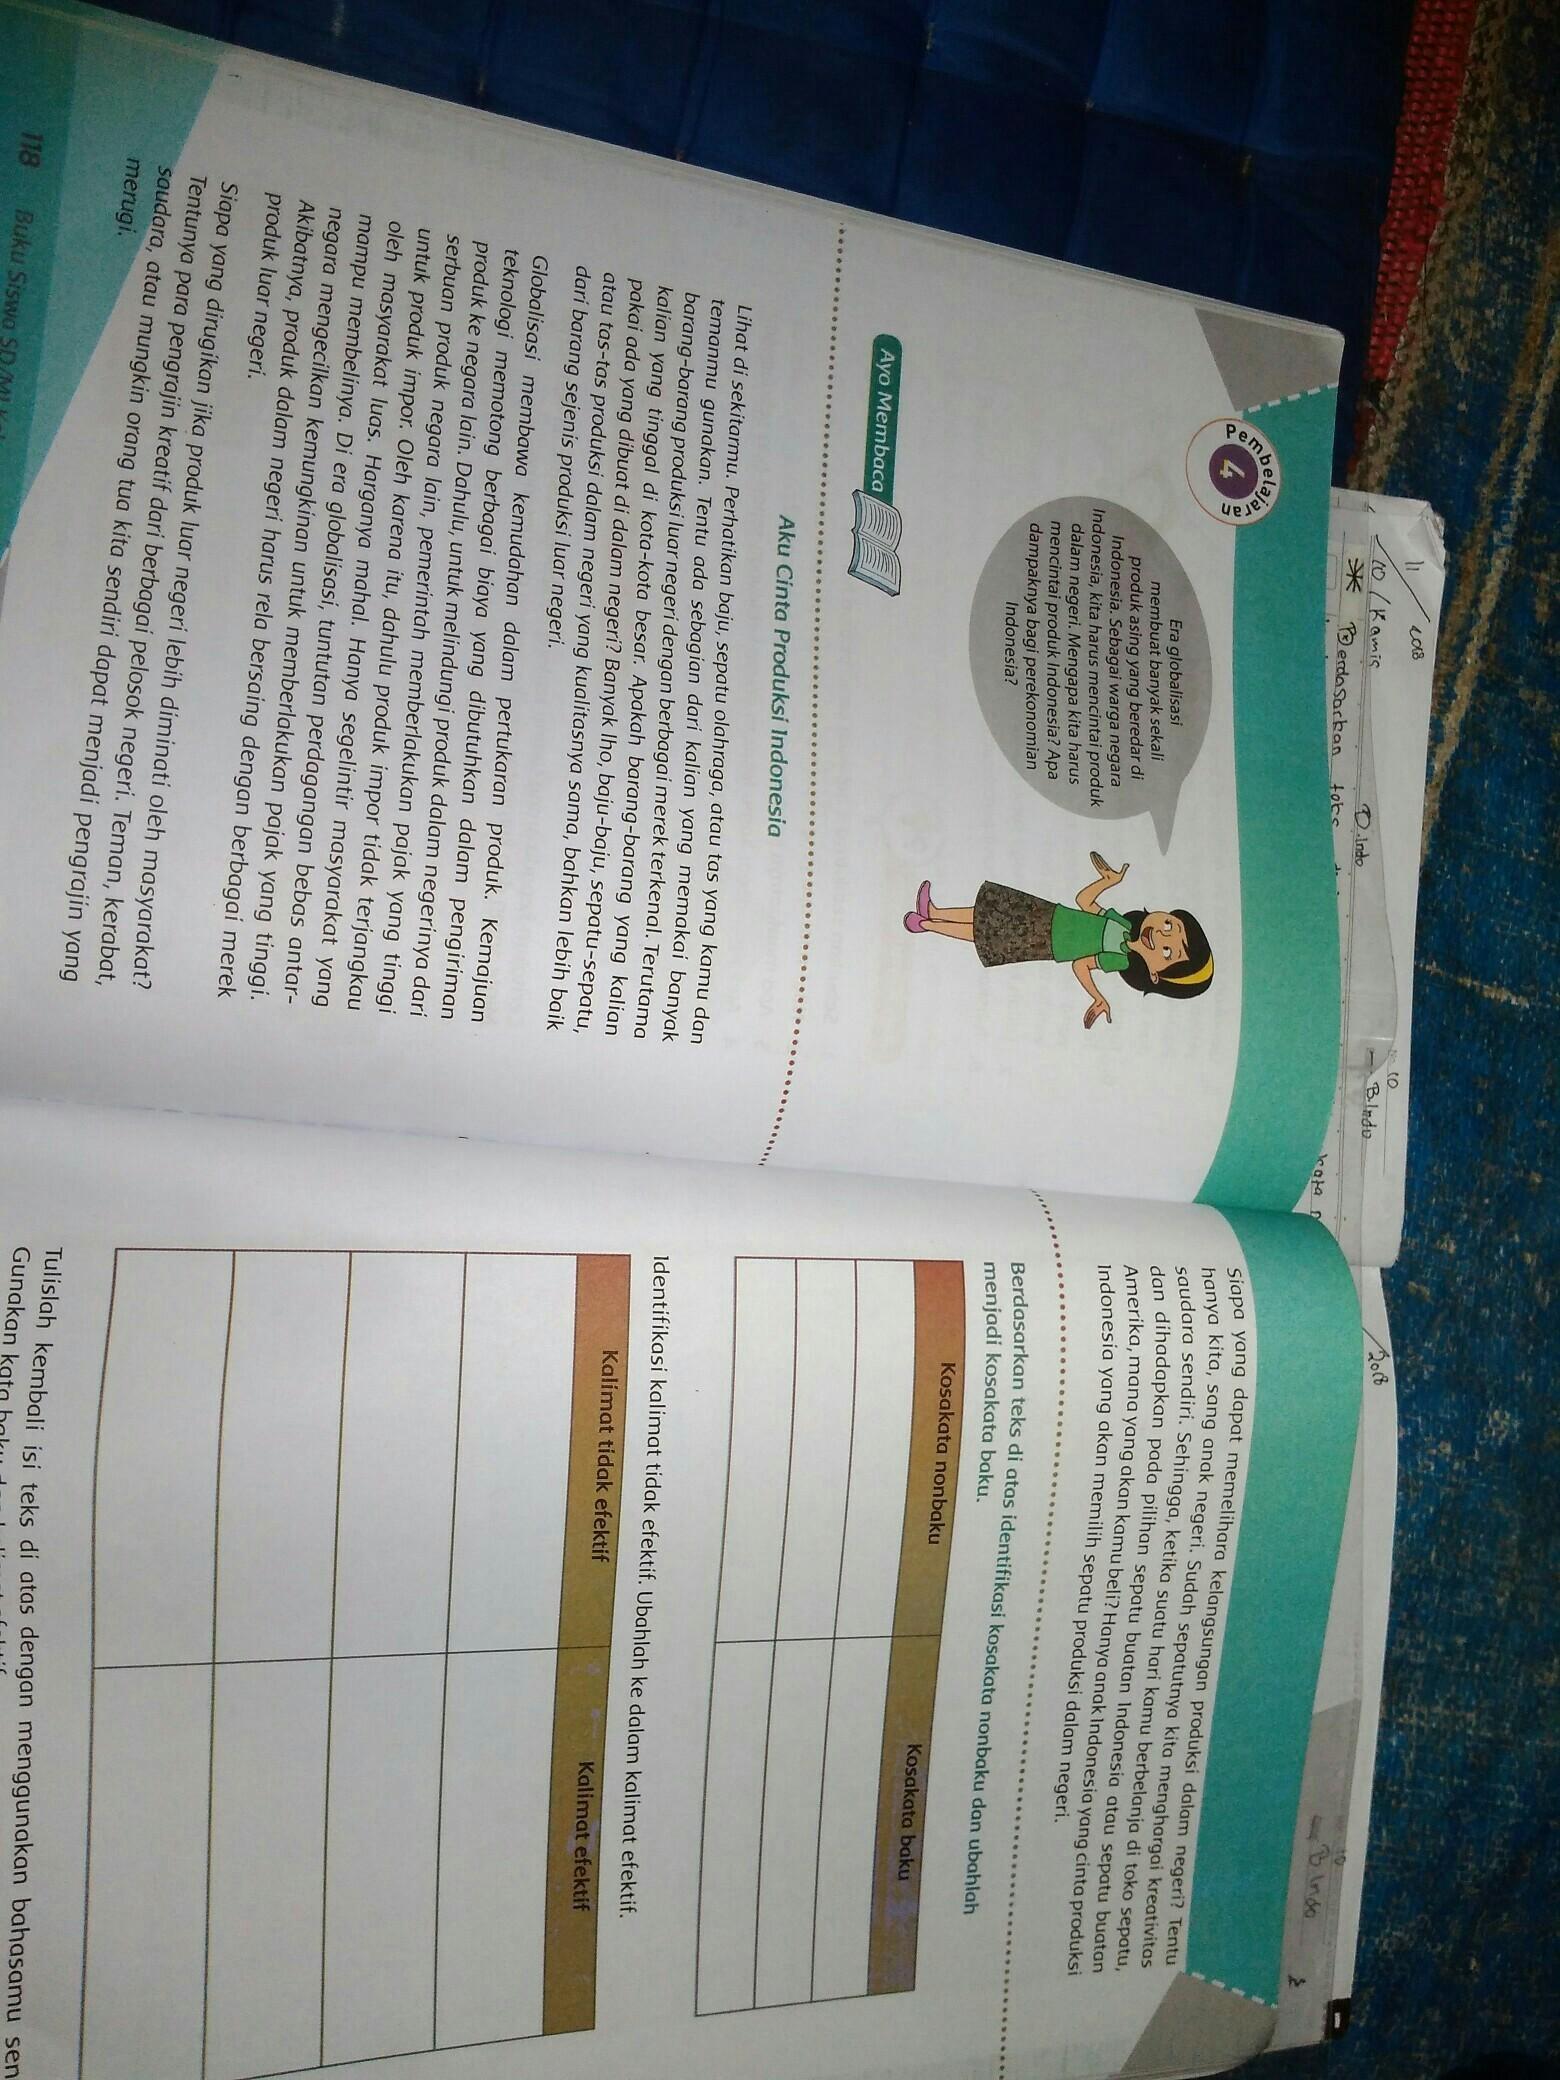 Sebutkan Contoh Contoh Produk Buatan Indonesia : sebutkan, contoh, produk, buatan, indonesia, 1.mengapa, Harus, Cinta, Produk, Indonesia?, 2.apa, Contoh, Tindakan, Brainly.co.id